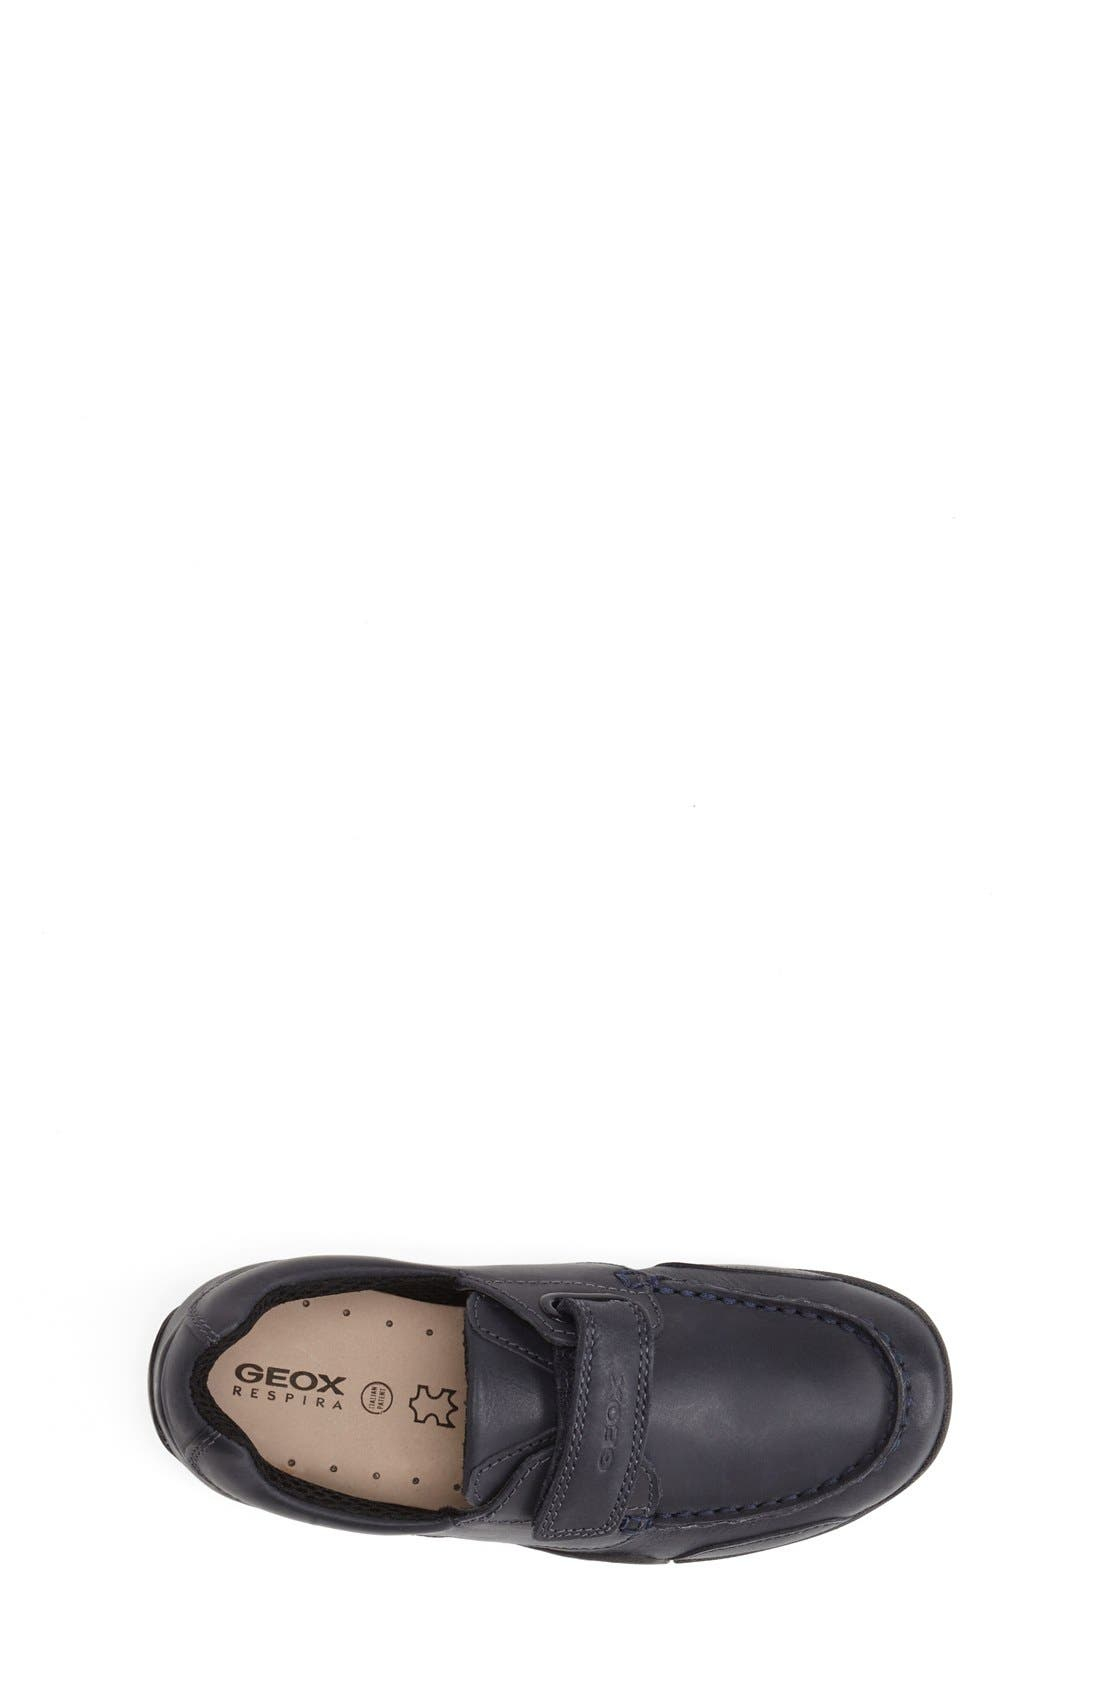 Snake Moc 2 Leather Waterproof Loafer,                             Alternate thumbnail 3, color,                             NAVY